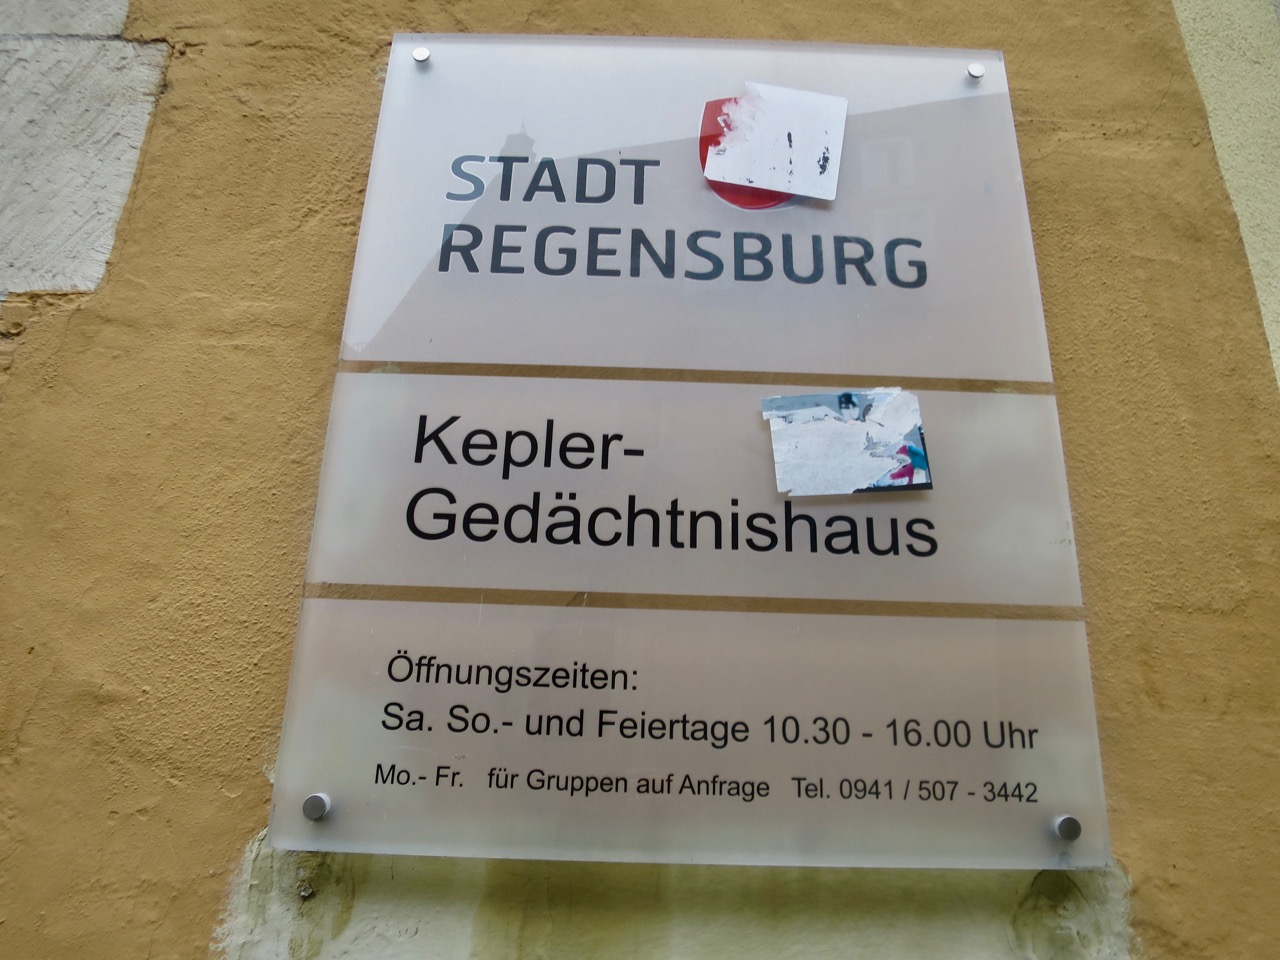 Regensburg 1 19